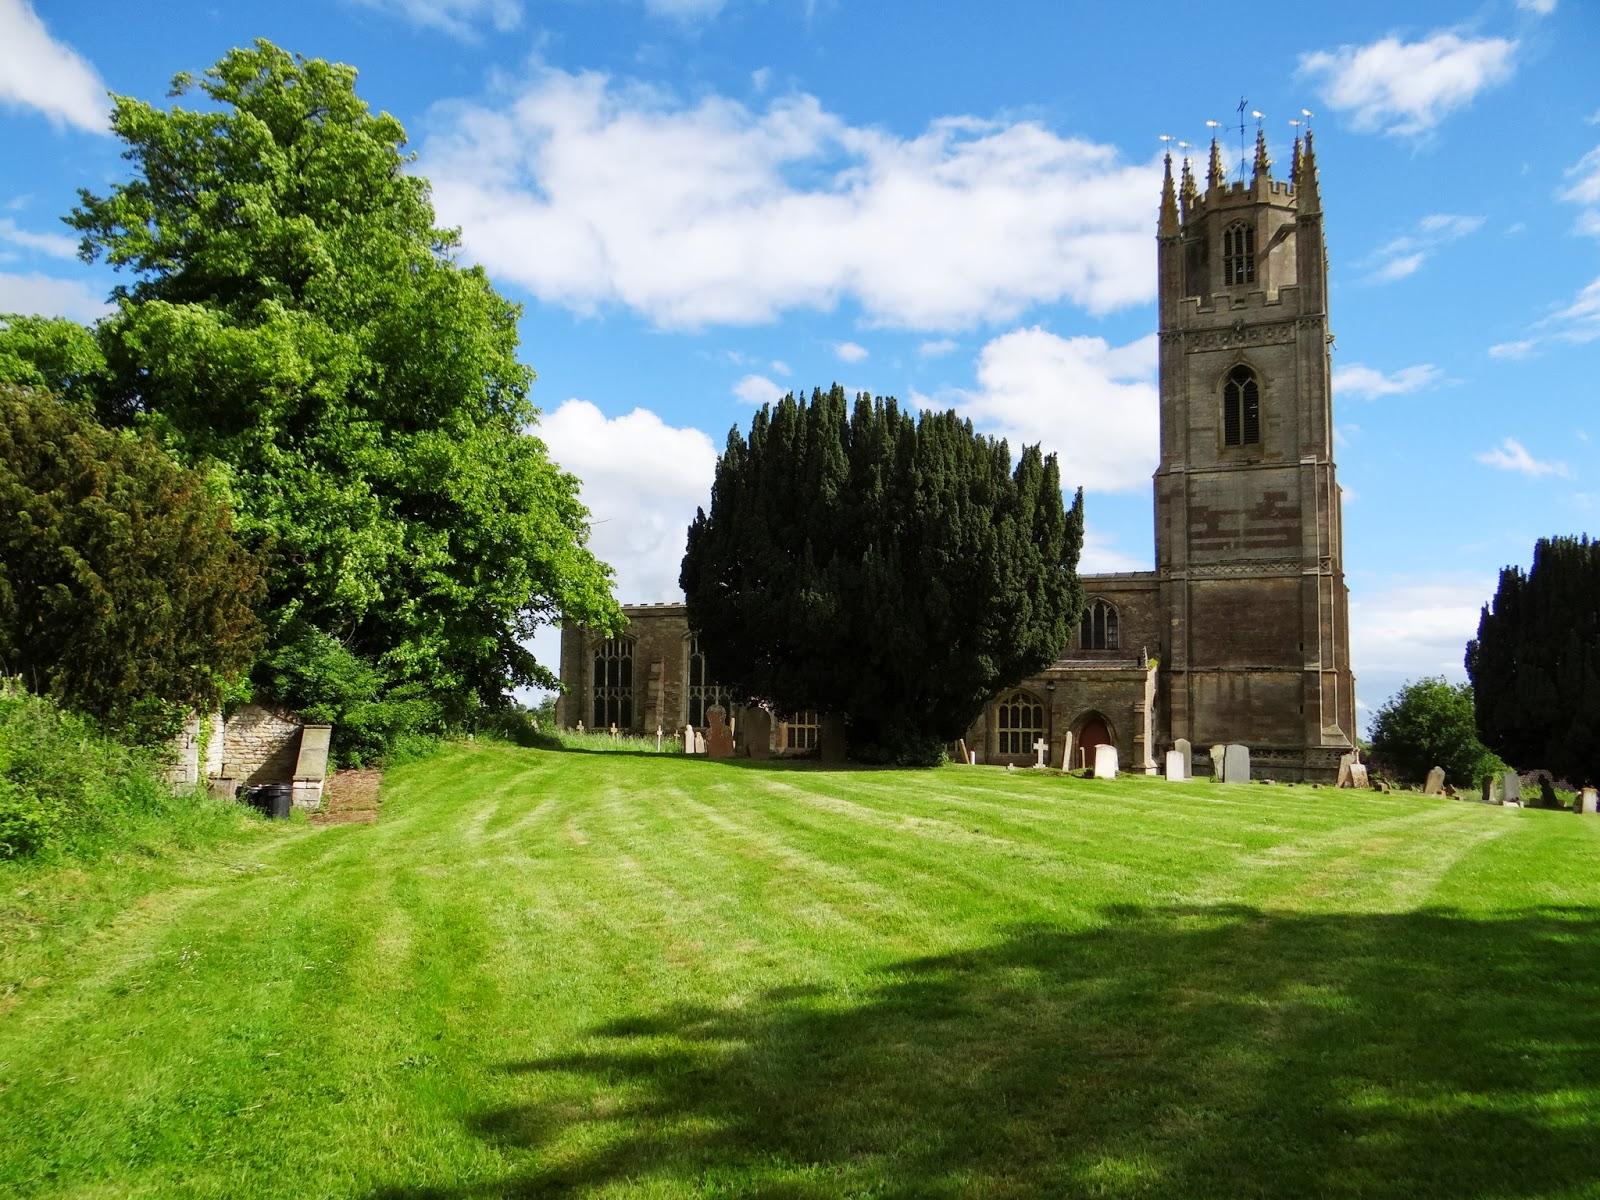 Lowick Church